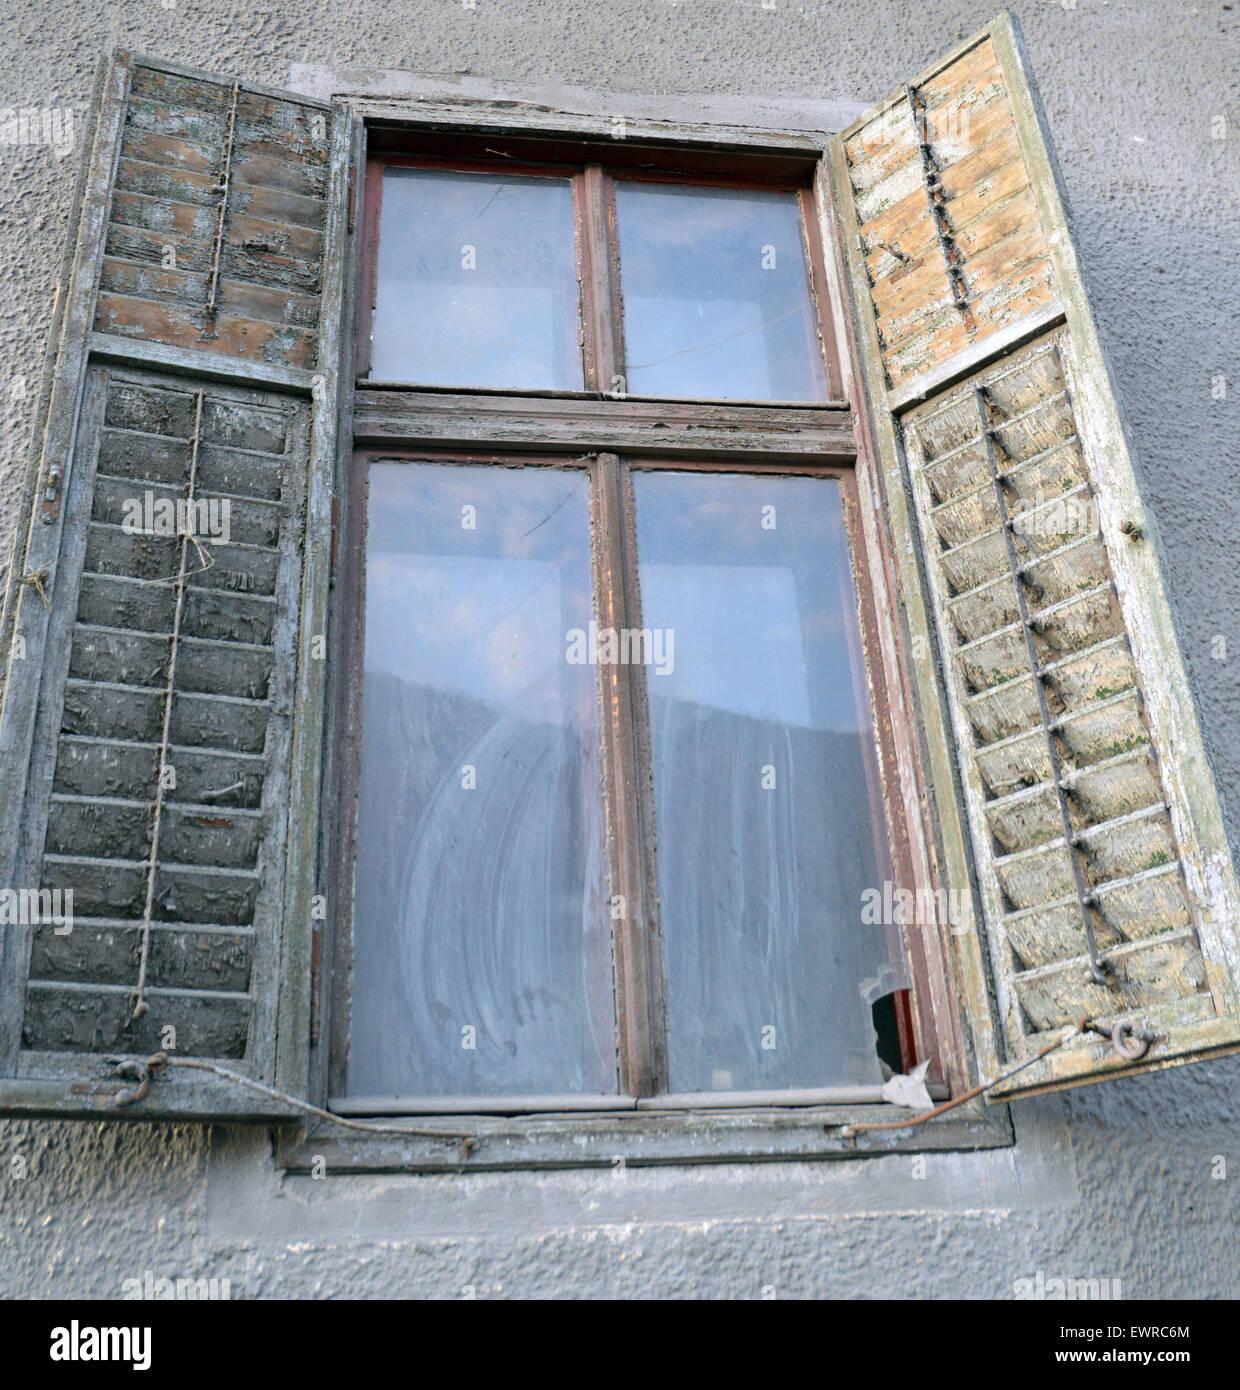 Old wooden shuttered window in Sibiu, Romania - Stock Image